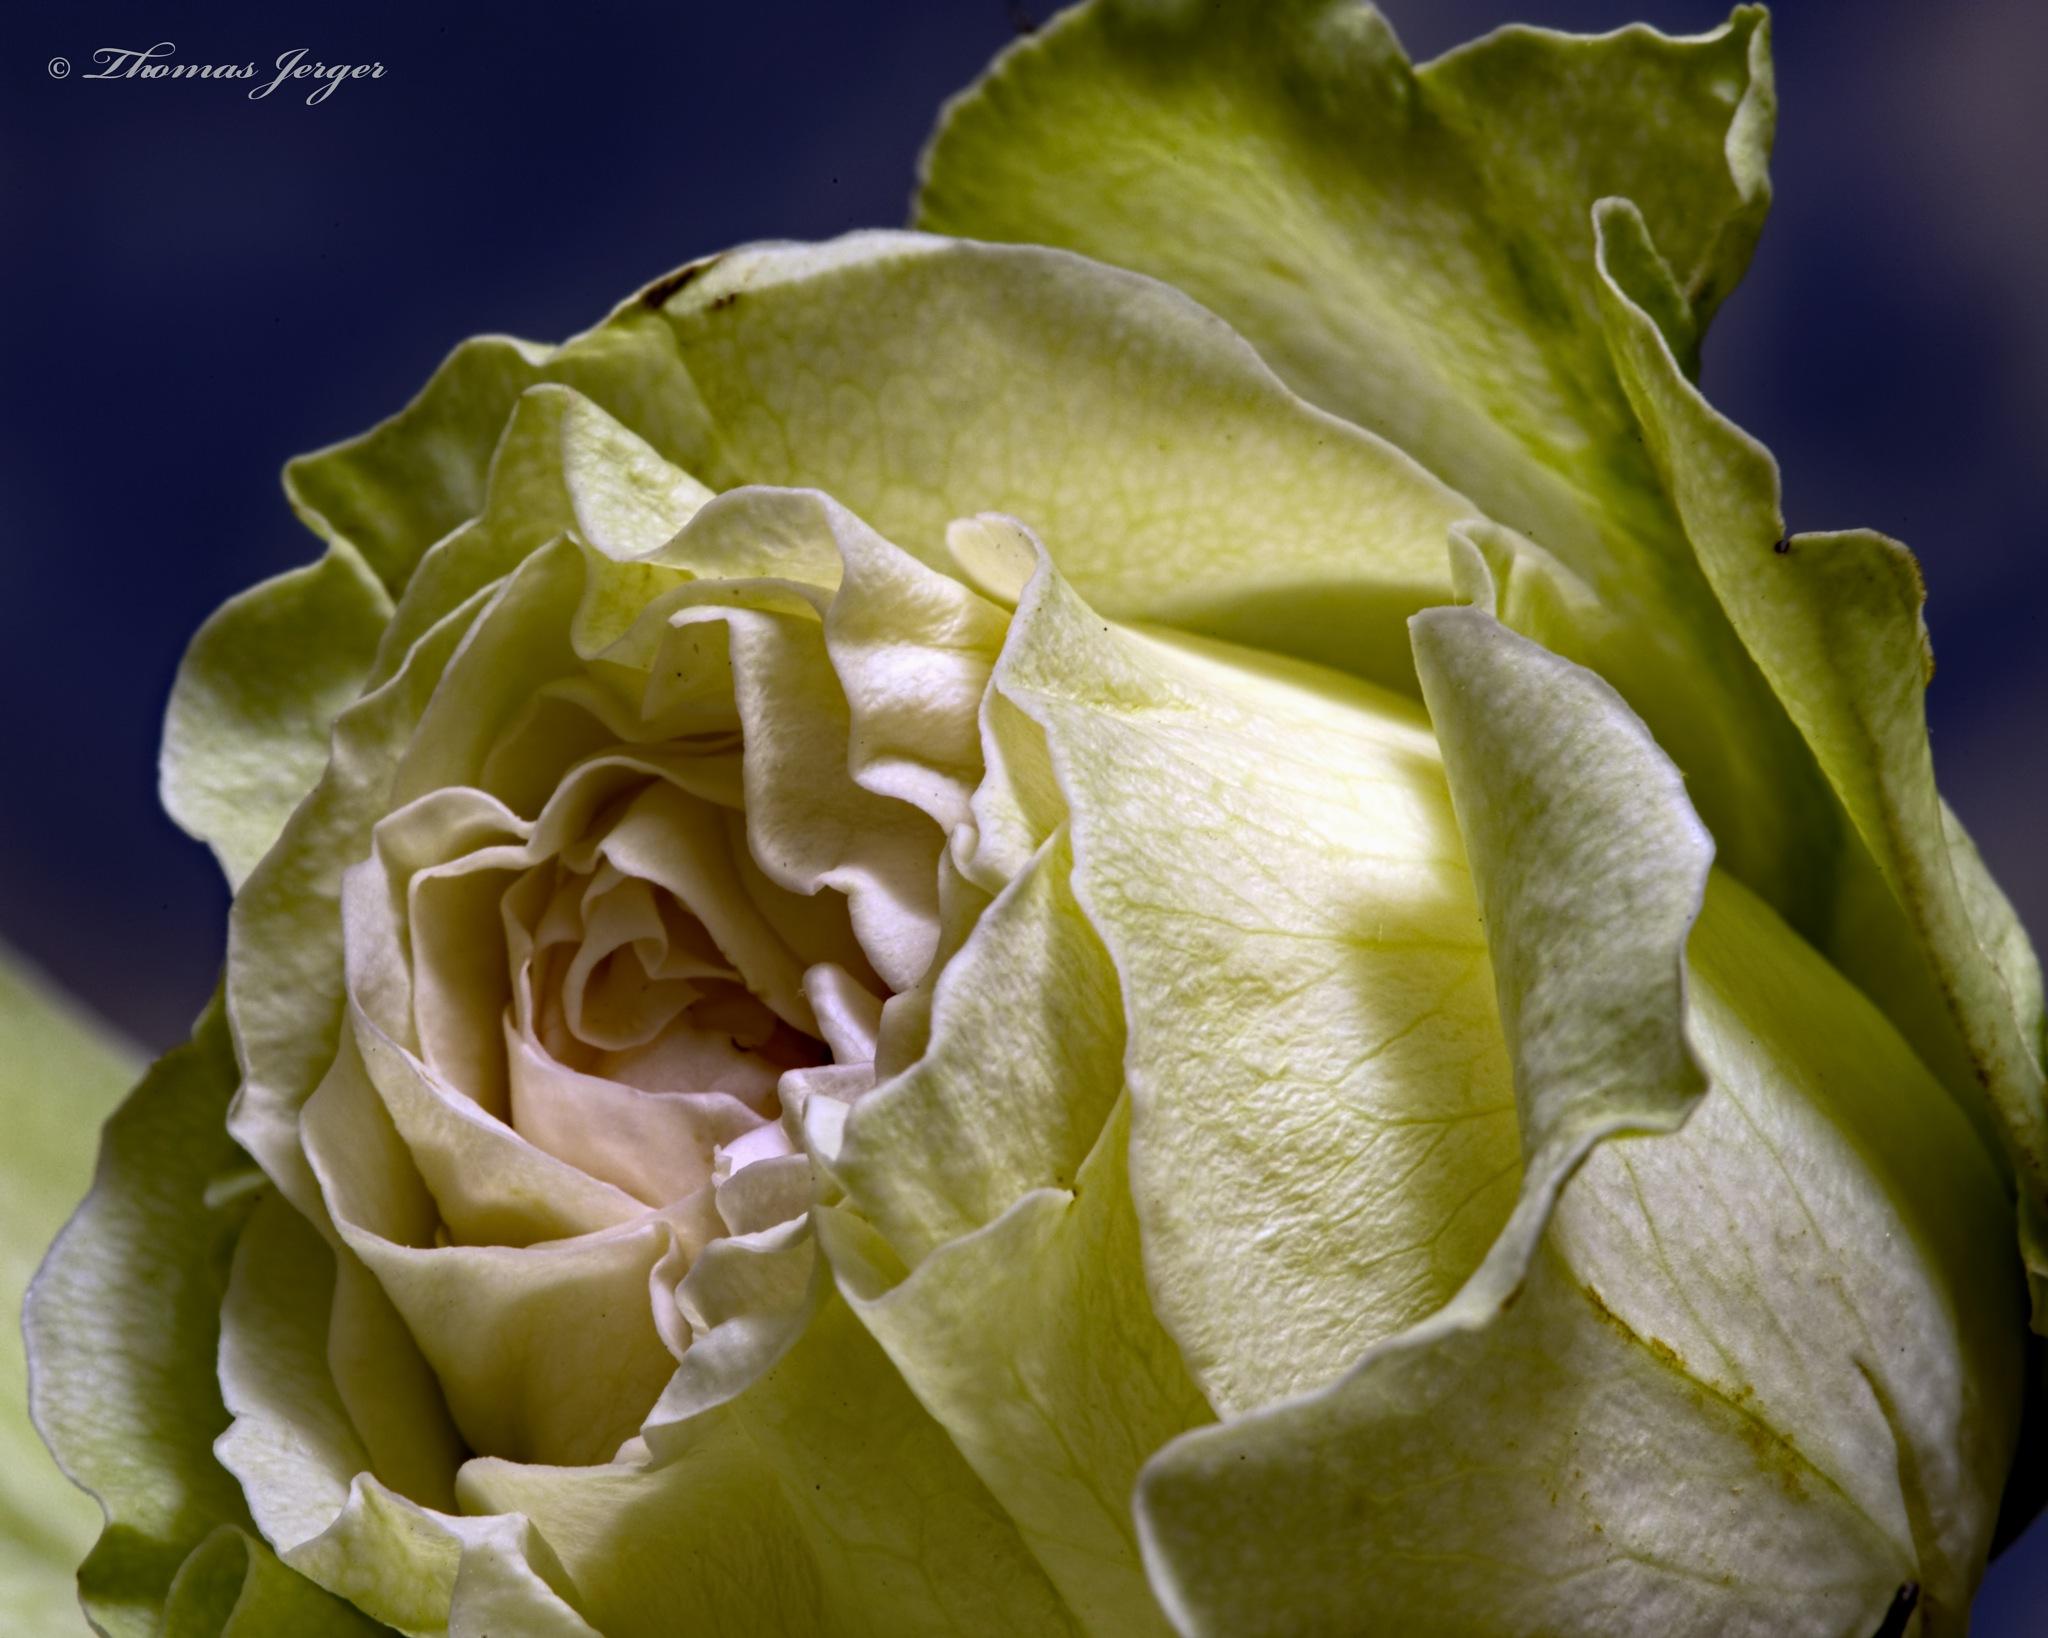 Yellow Pink Spray Rose 0202 by ThomasJerger